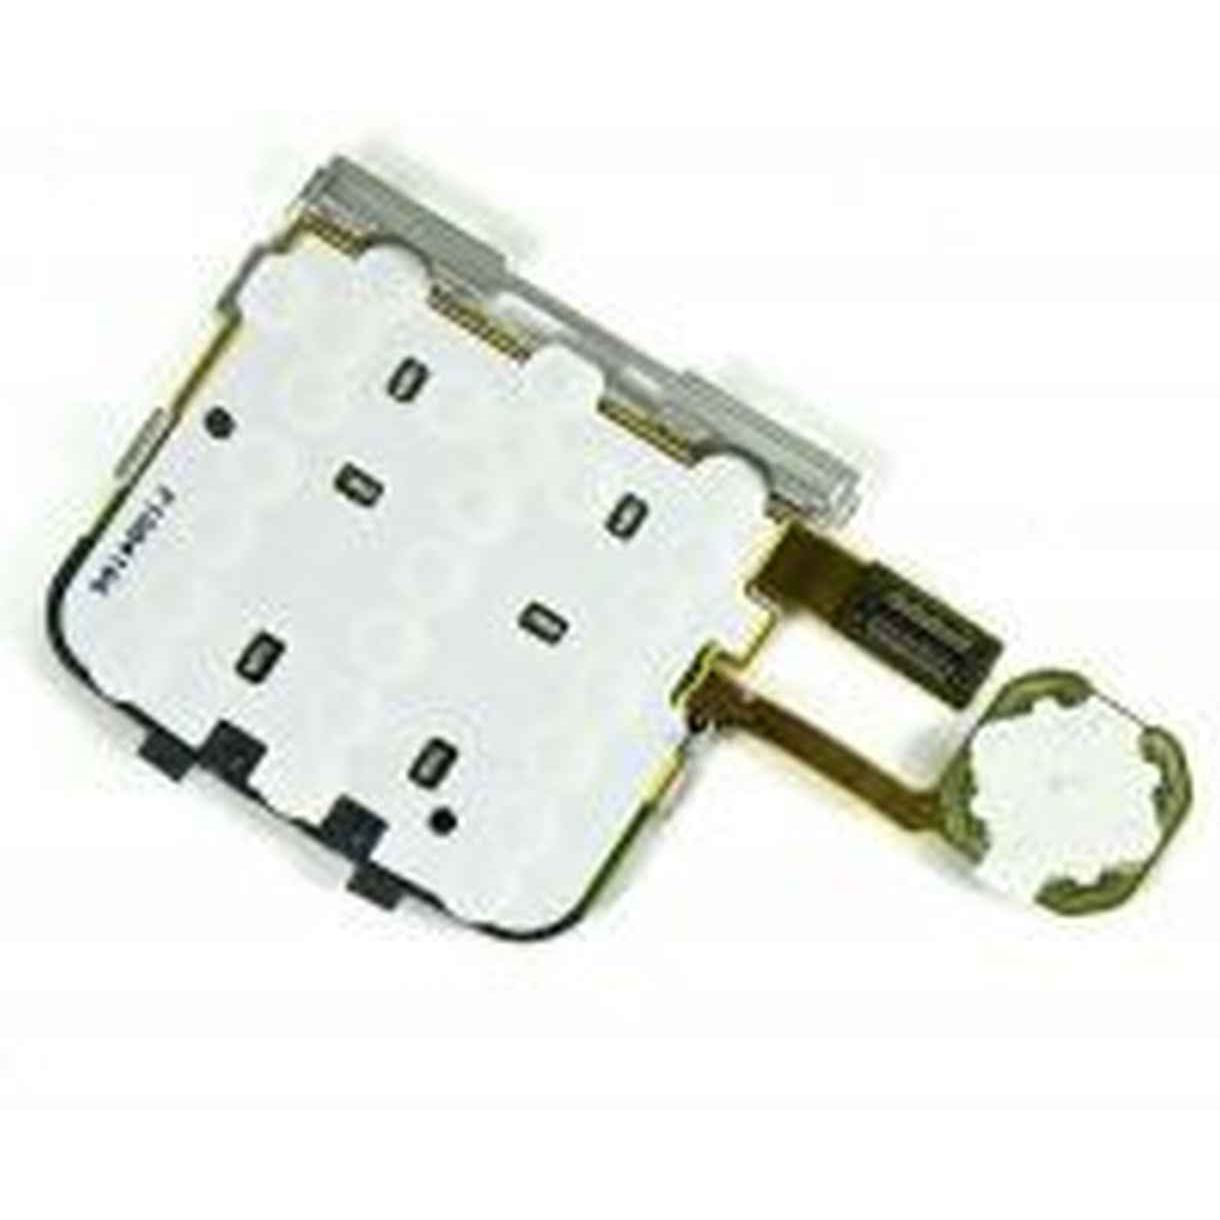 Internal Keypad Module For Nokia N79 Cell Phone - Maxbhi Com